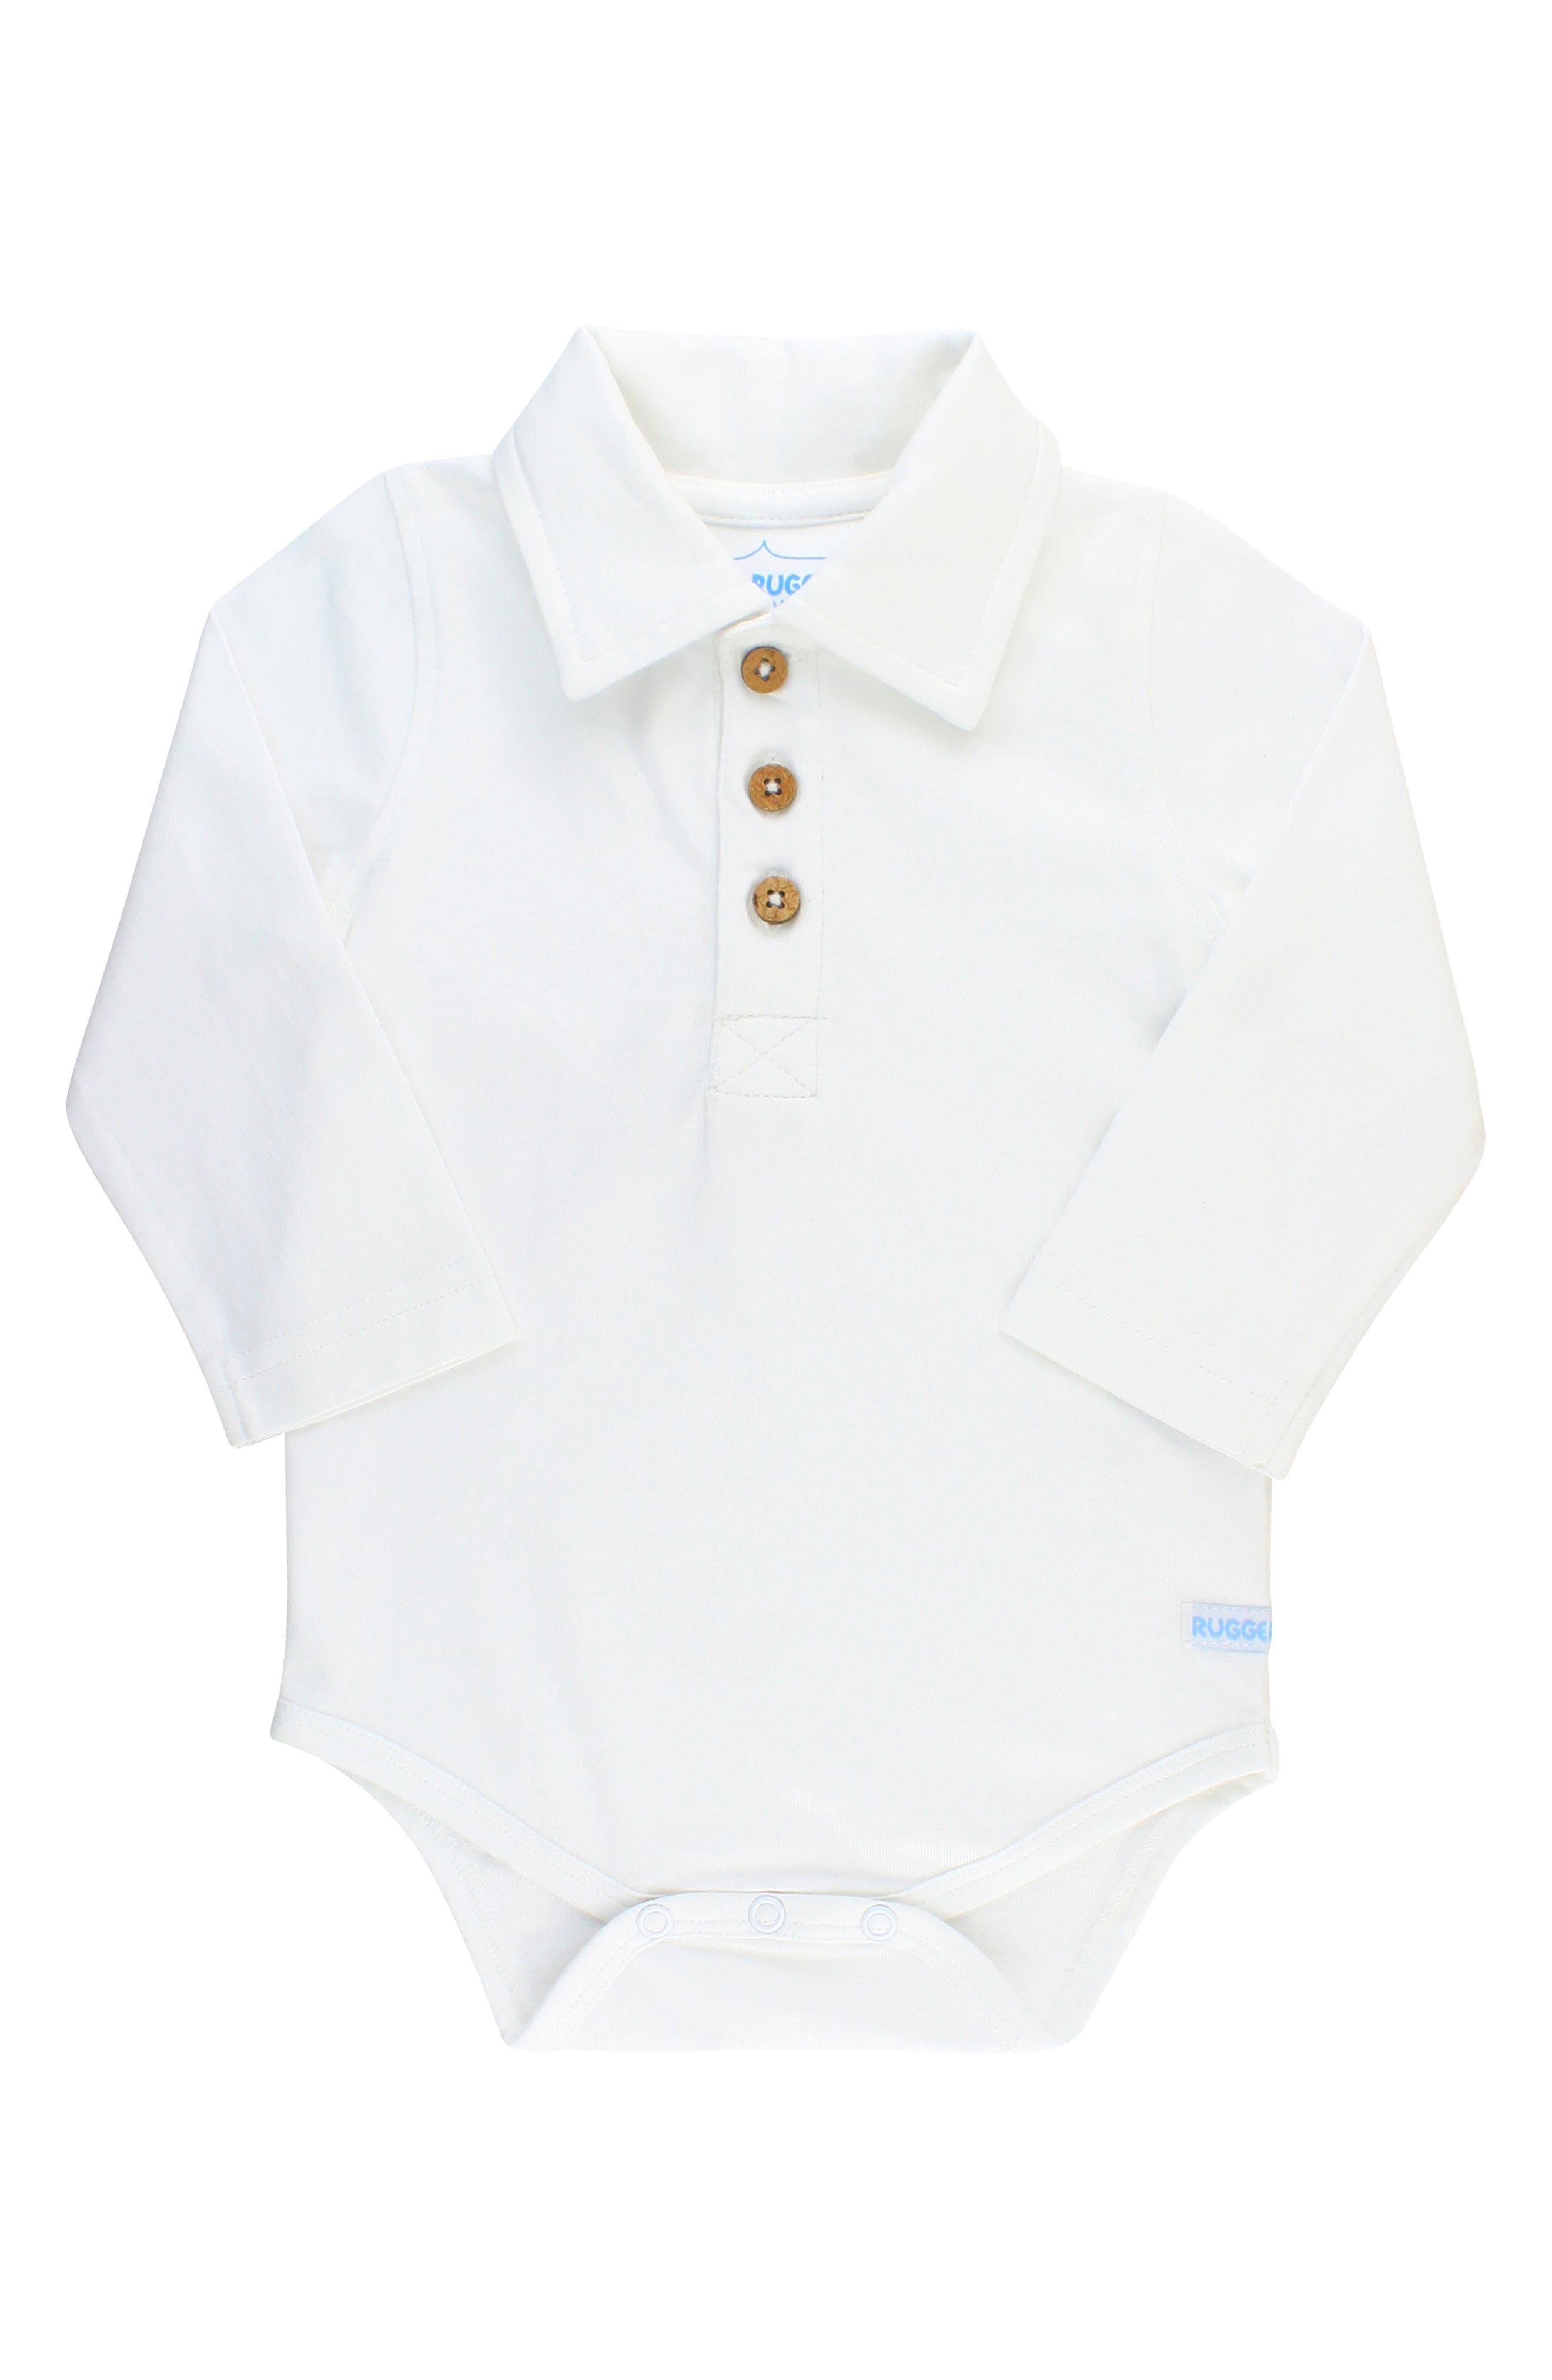 4e5cab7f9700c Ruggedbutts Newborn Clothing   Essentials